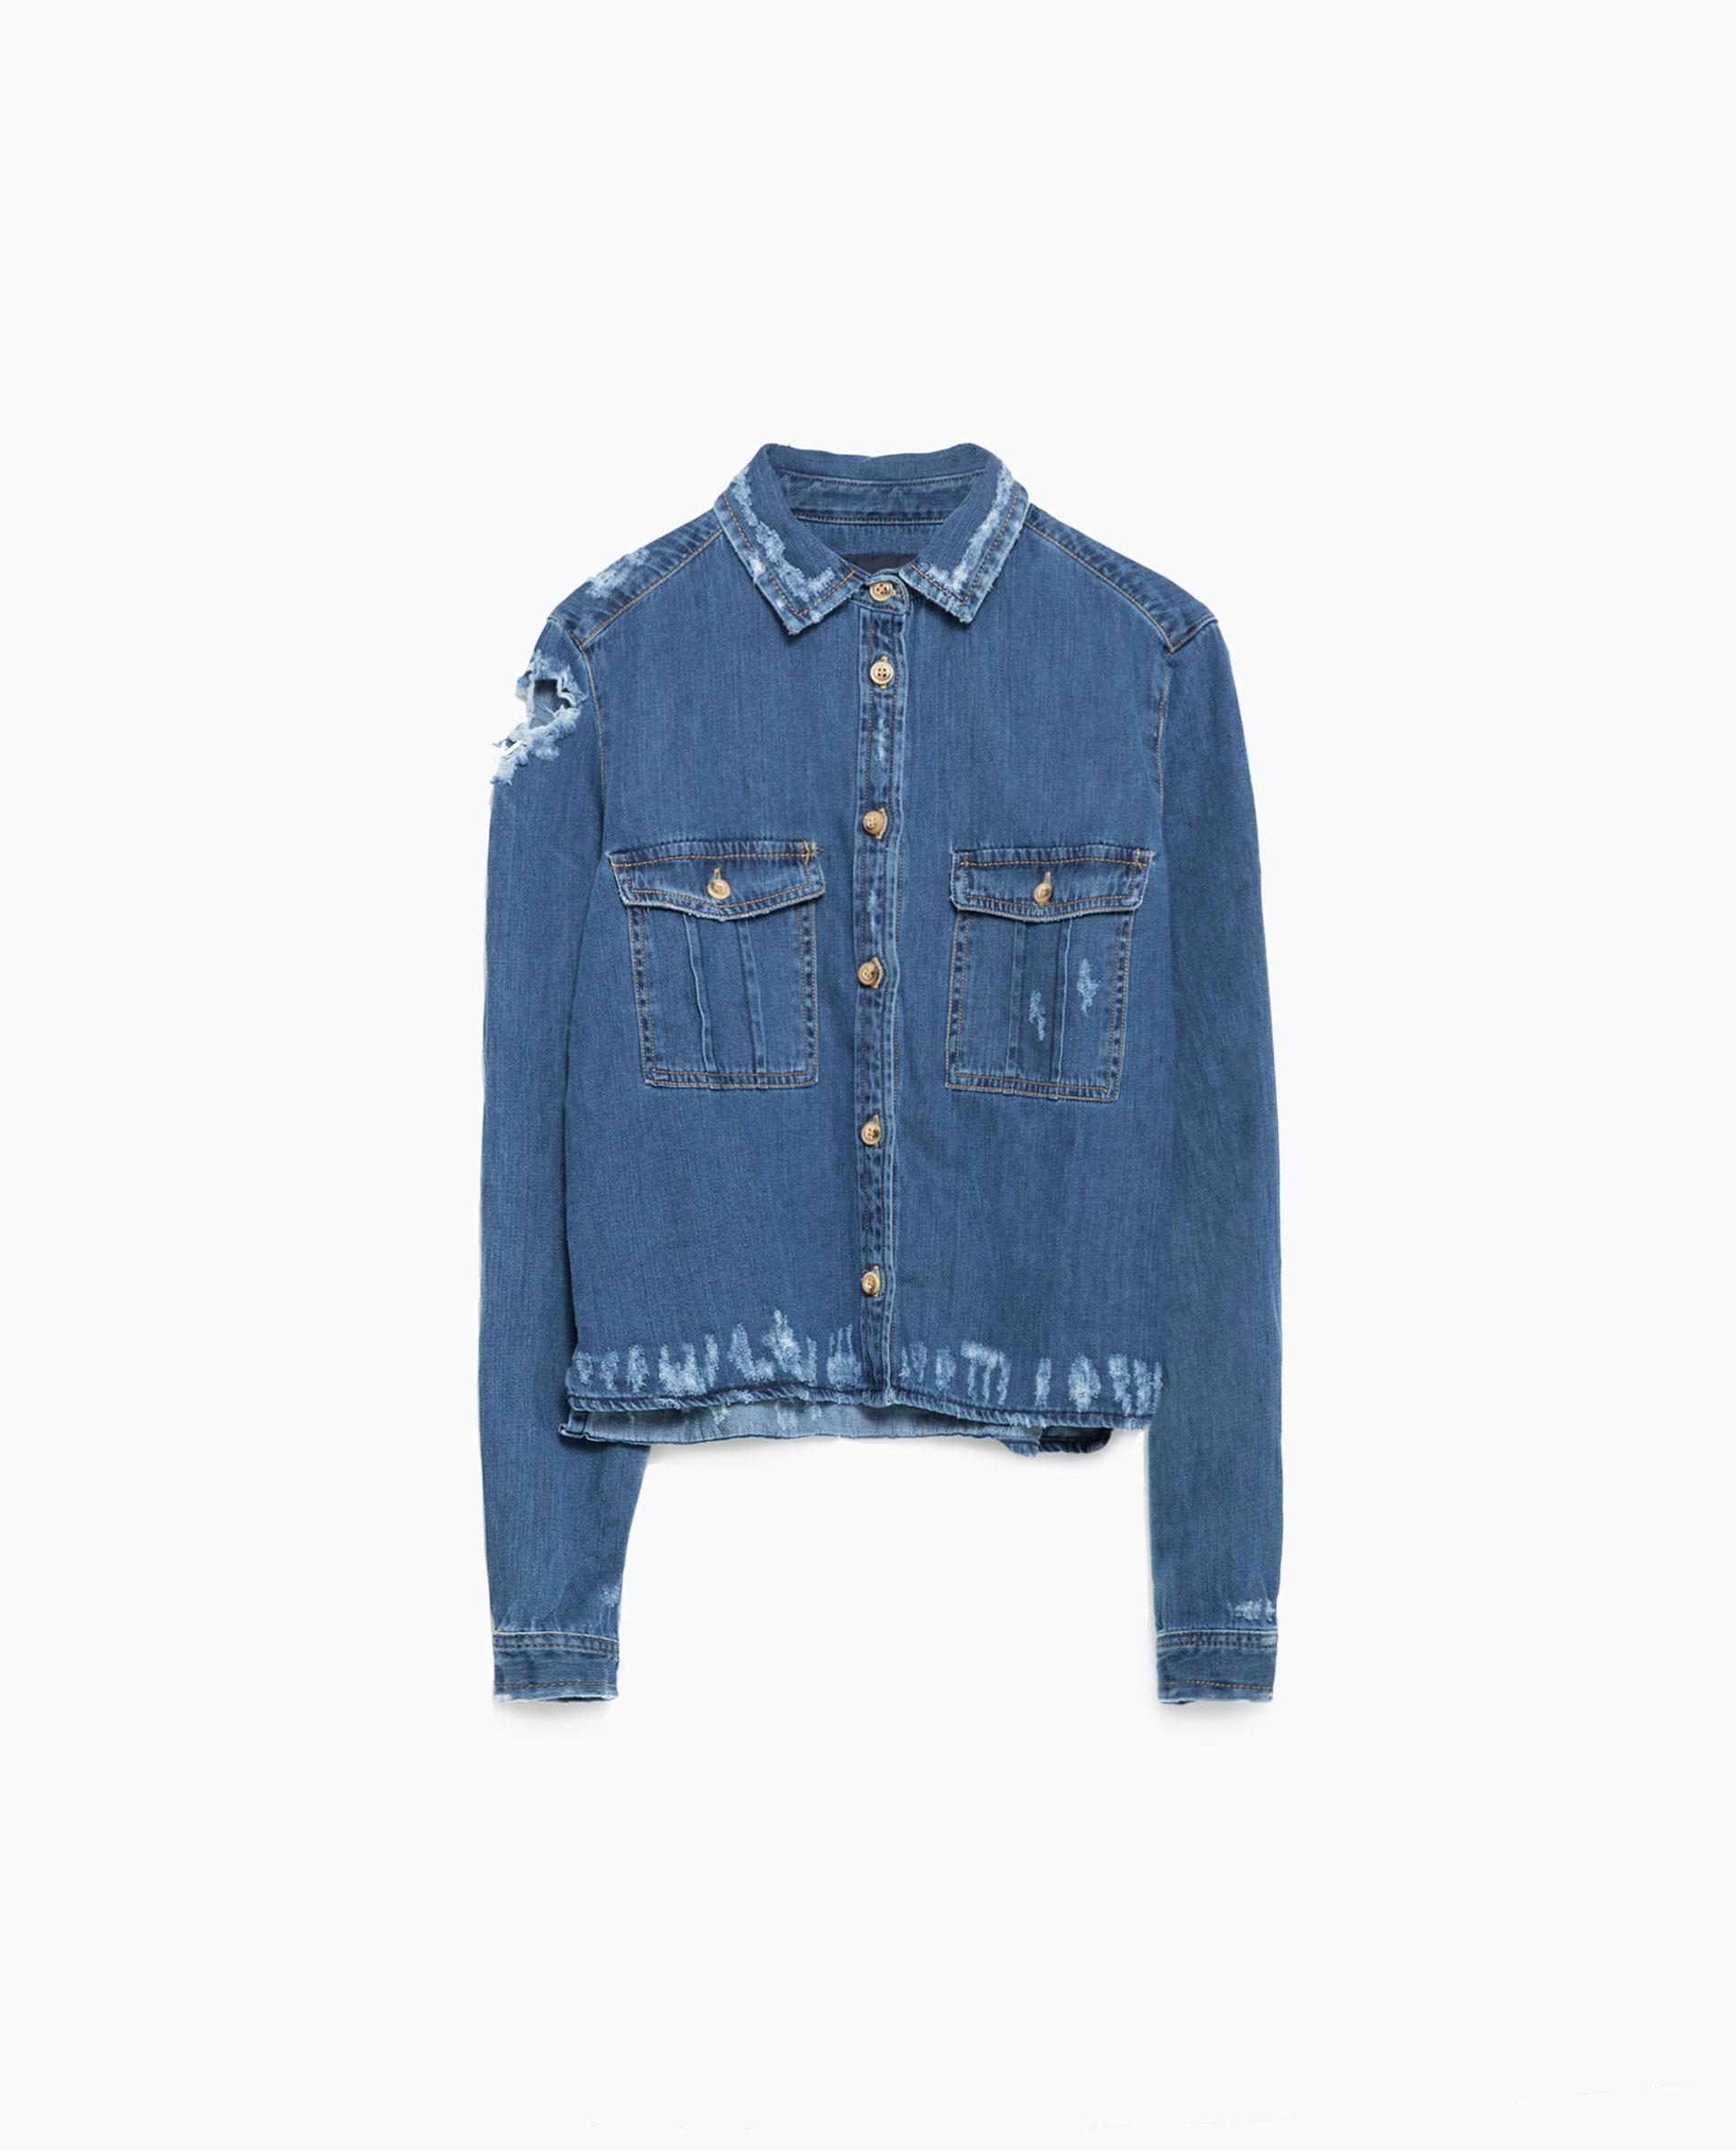 Zara Ripped Denim Shirt Ripped Denim Shirt in Blue | Lyst